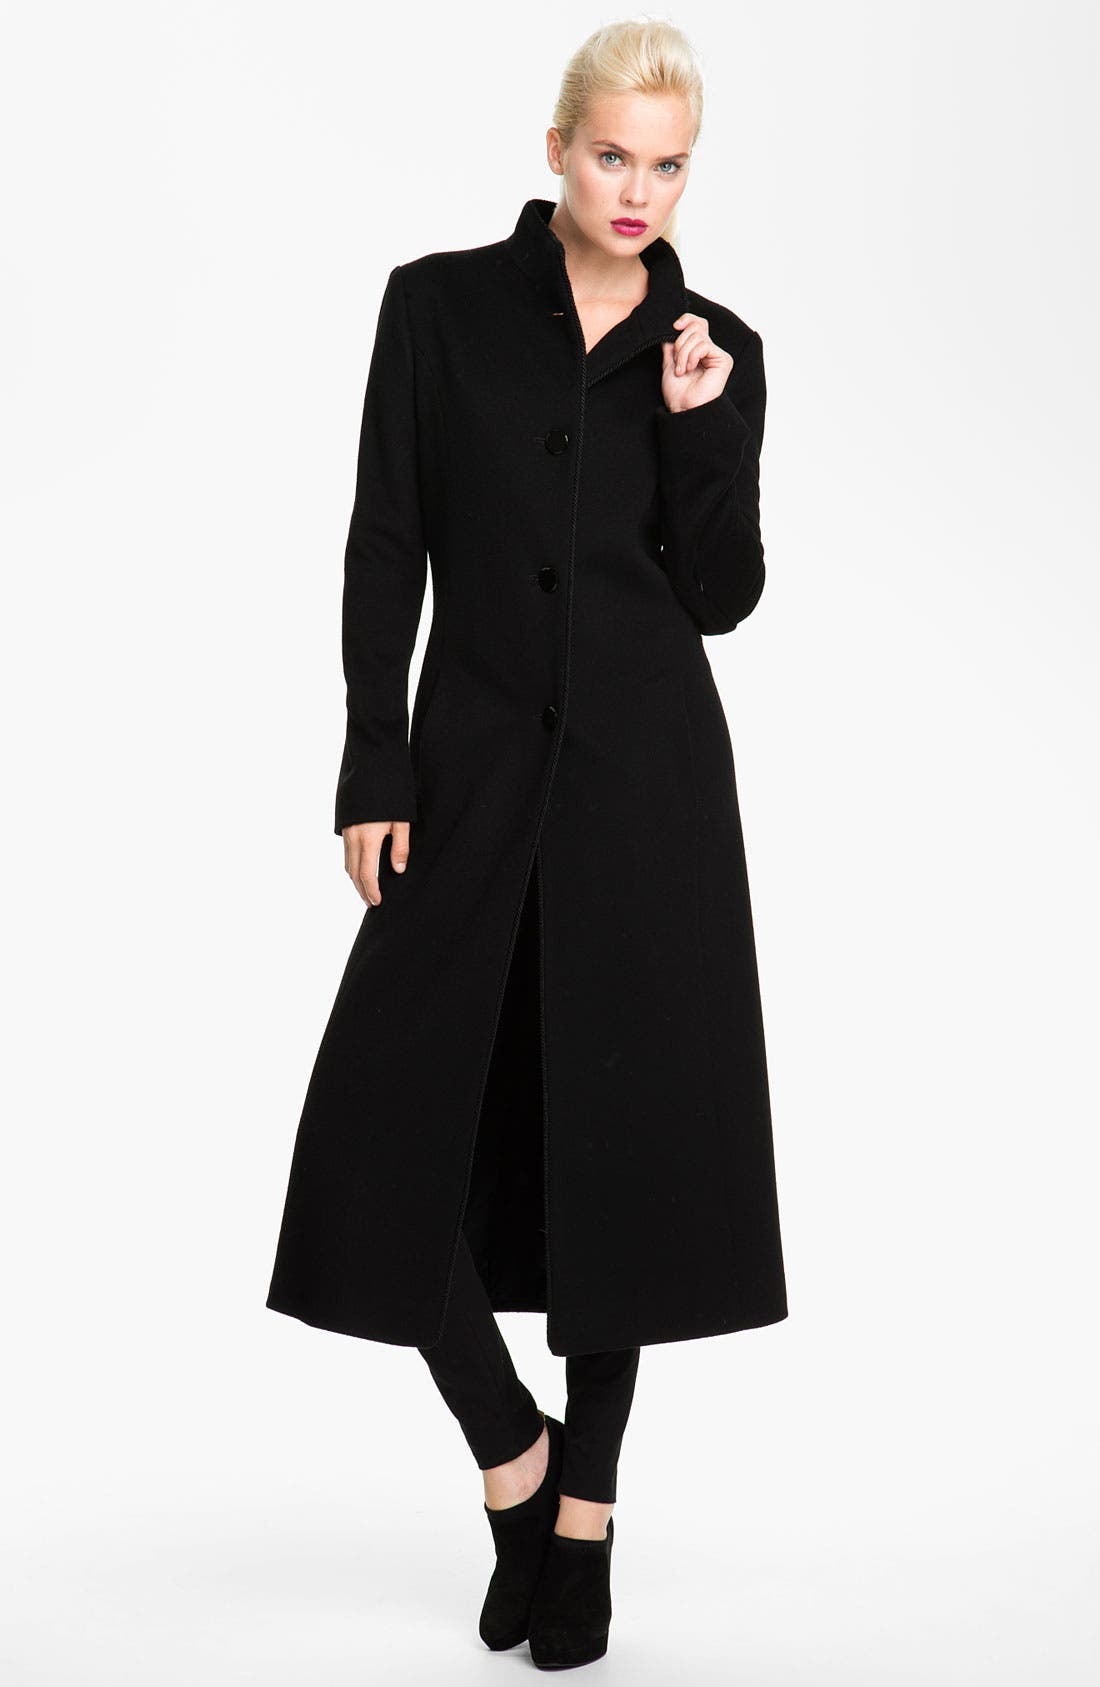 Alternate Image 1 Selected - Fleurette Stand Collar Loro Piana Wool Coat (Petite)